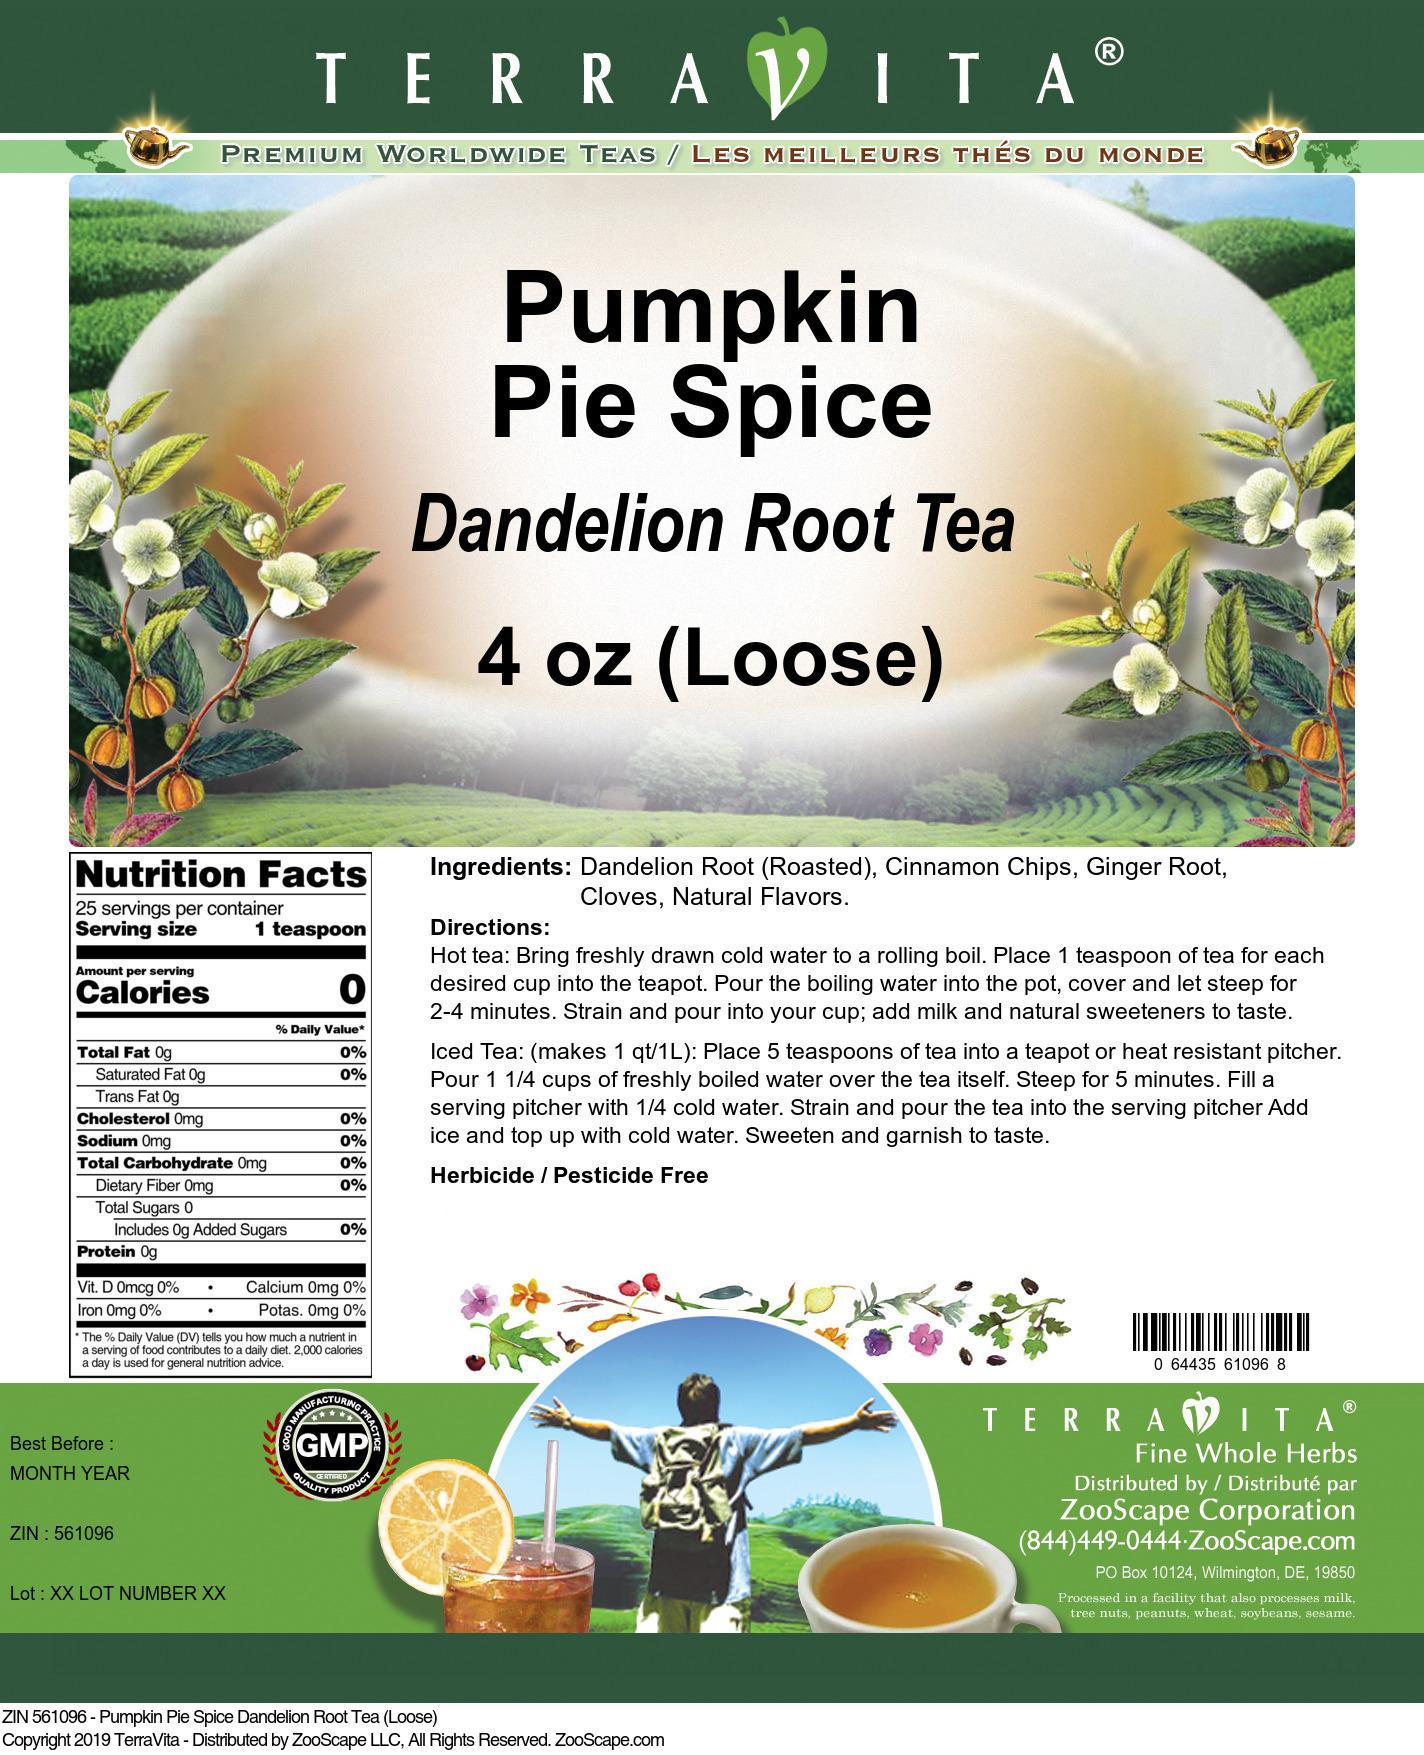 Pumpkin Pie Spice Dandelion Root